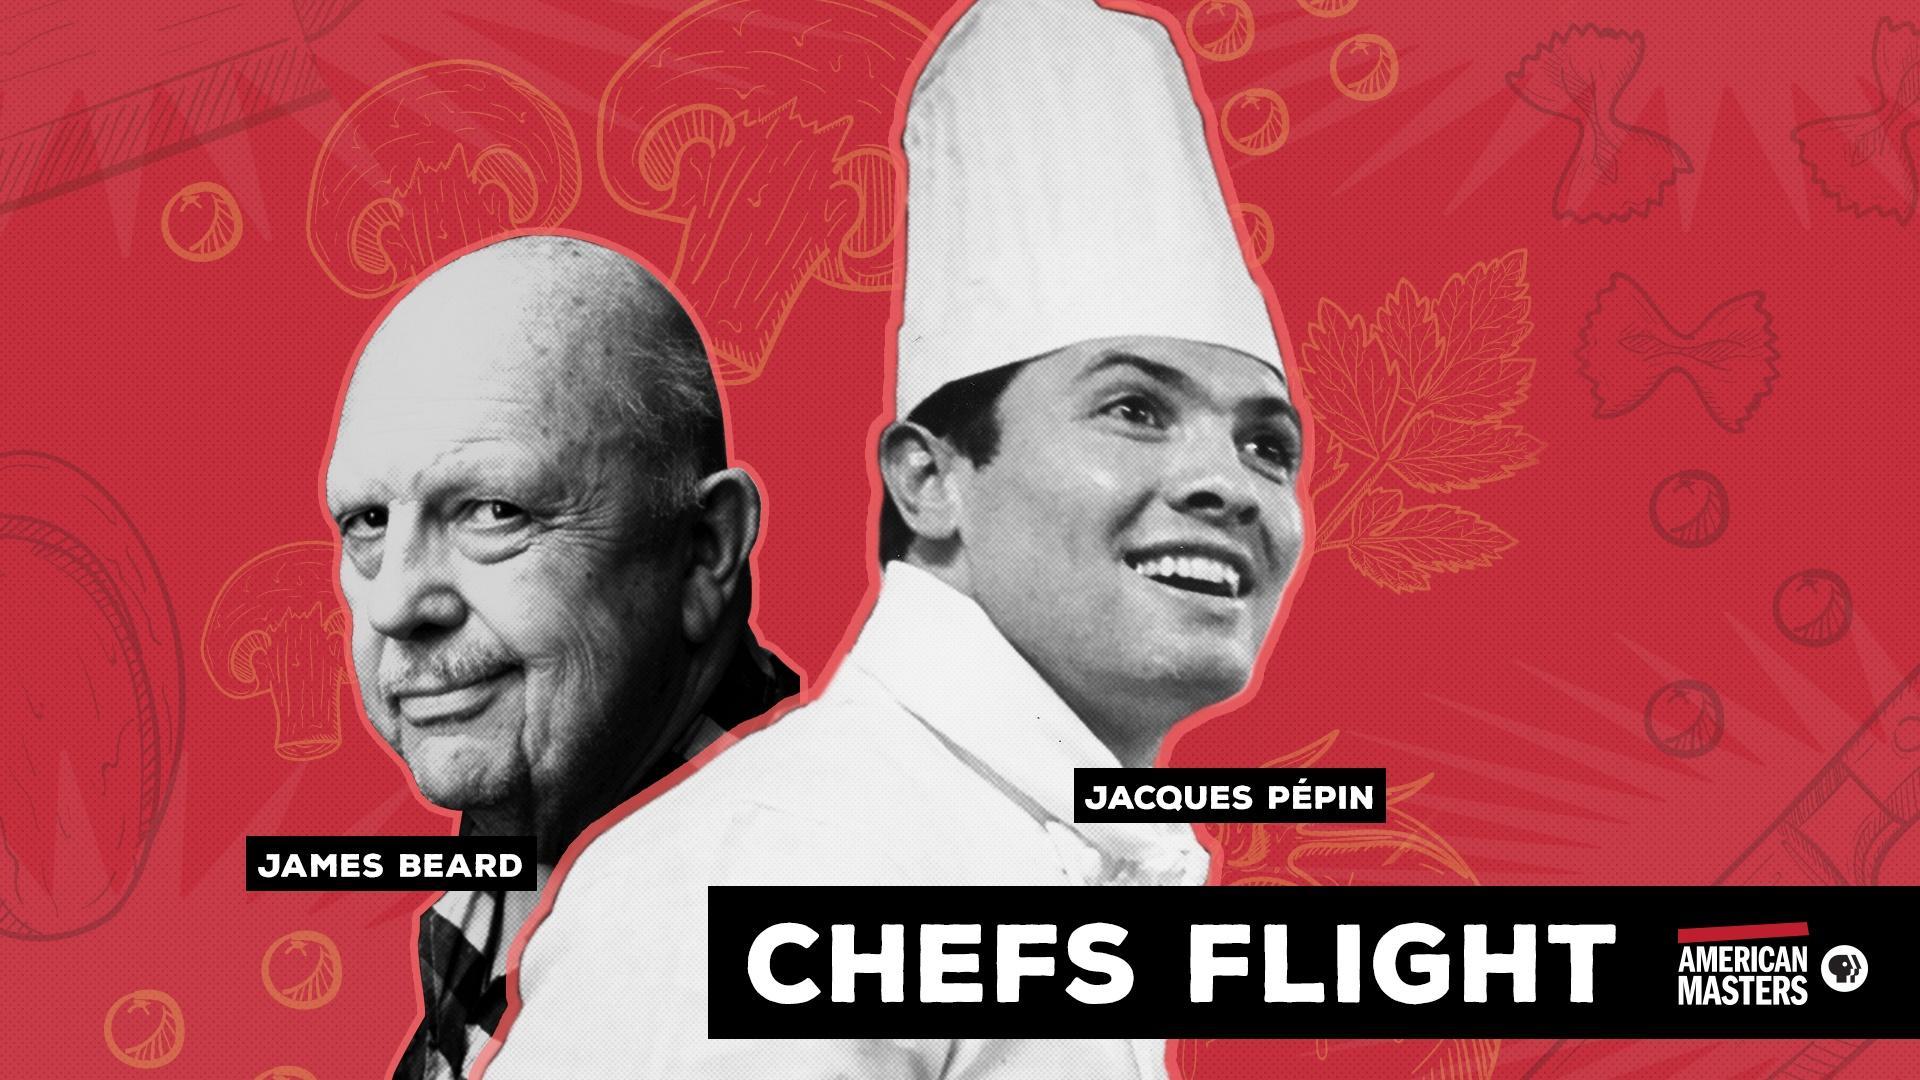 Chefs Flight